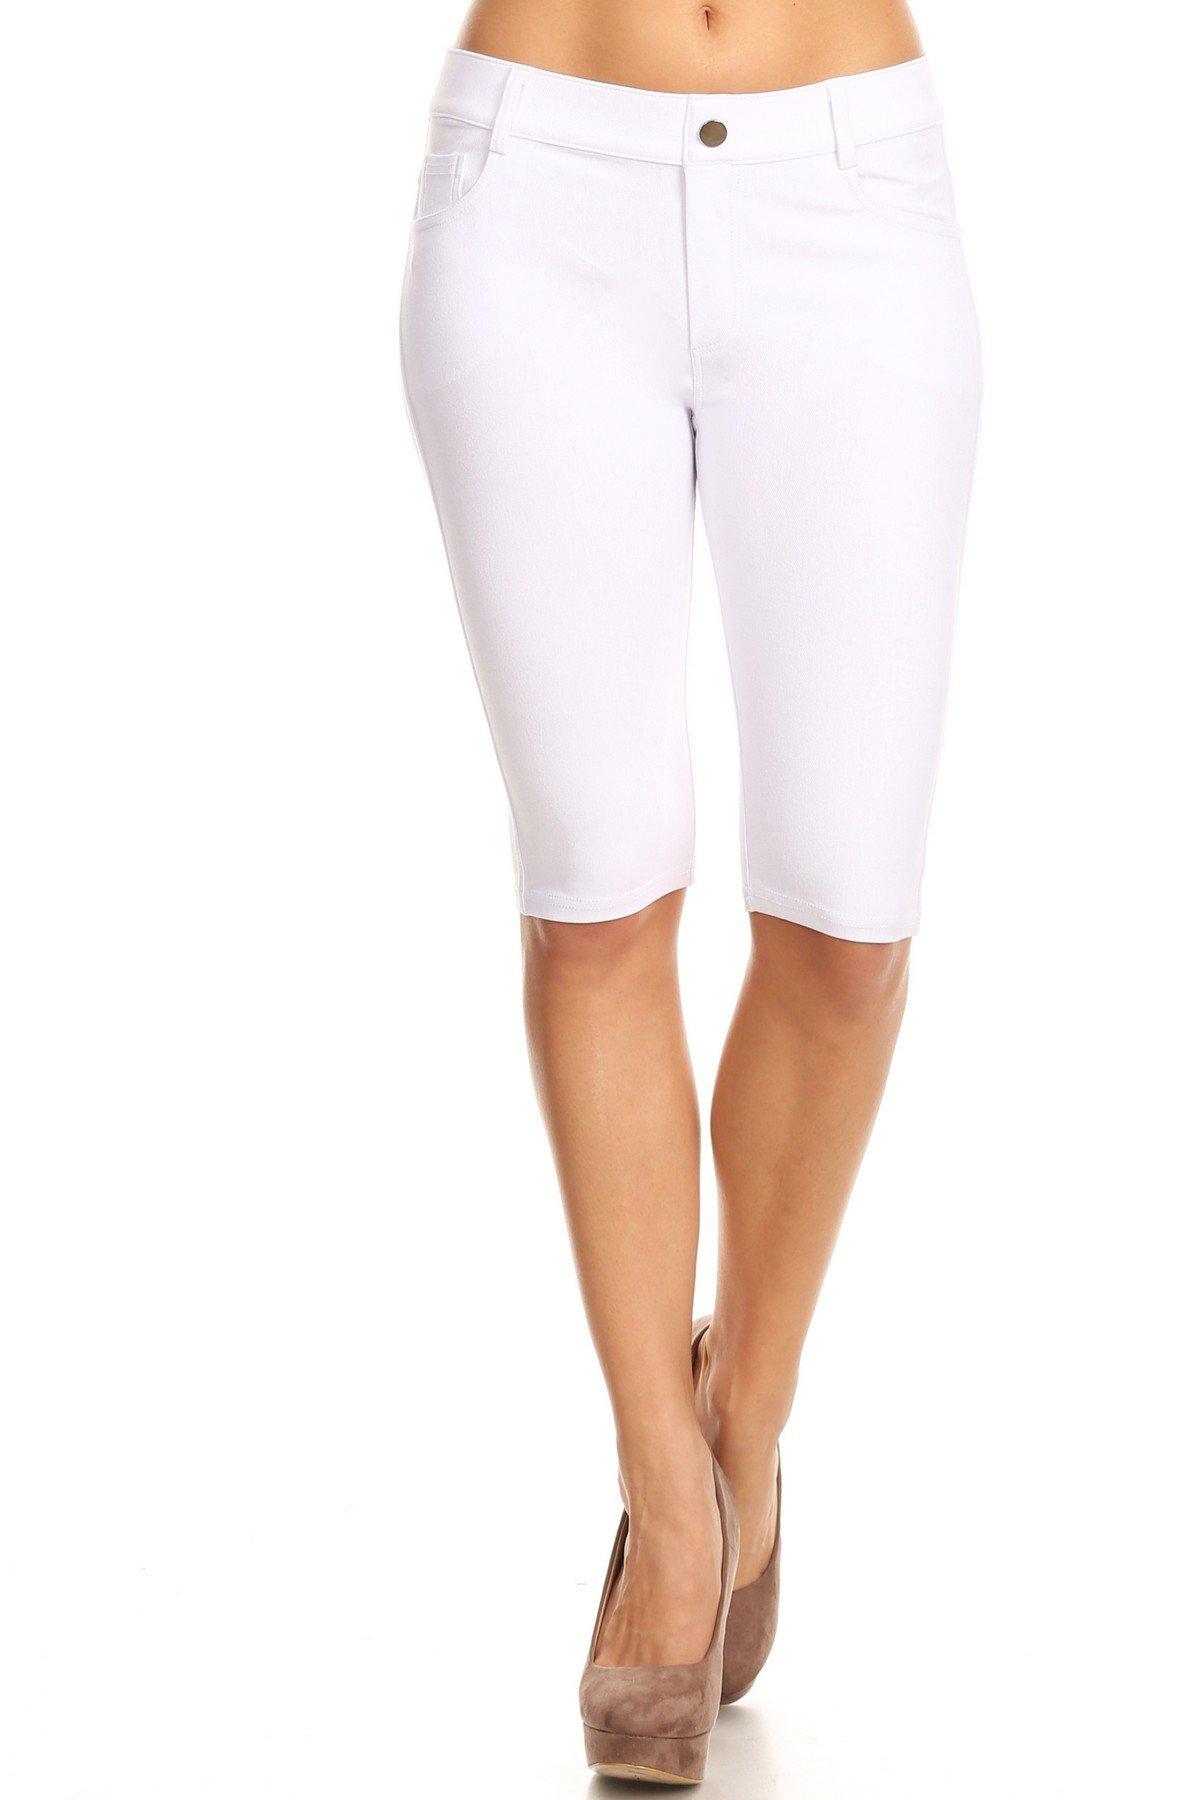 Yelete Women's Classic Bermuda Shorts (White, Large)